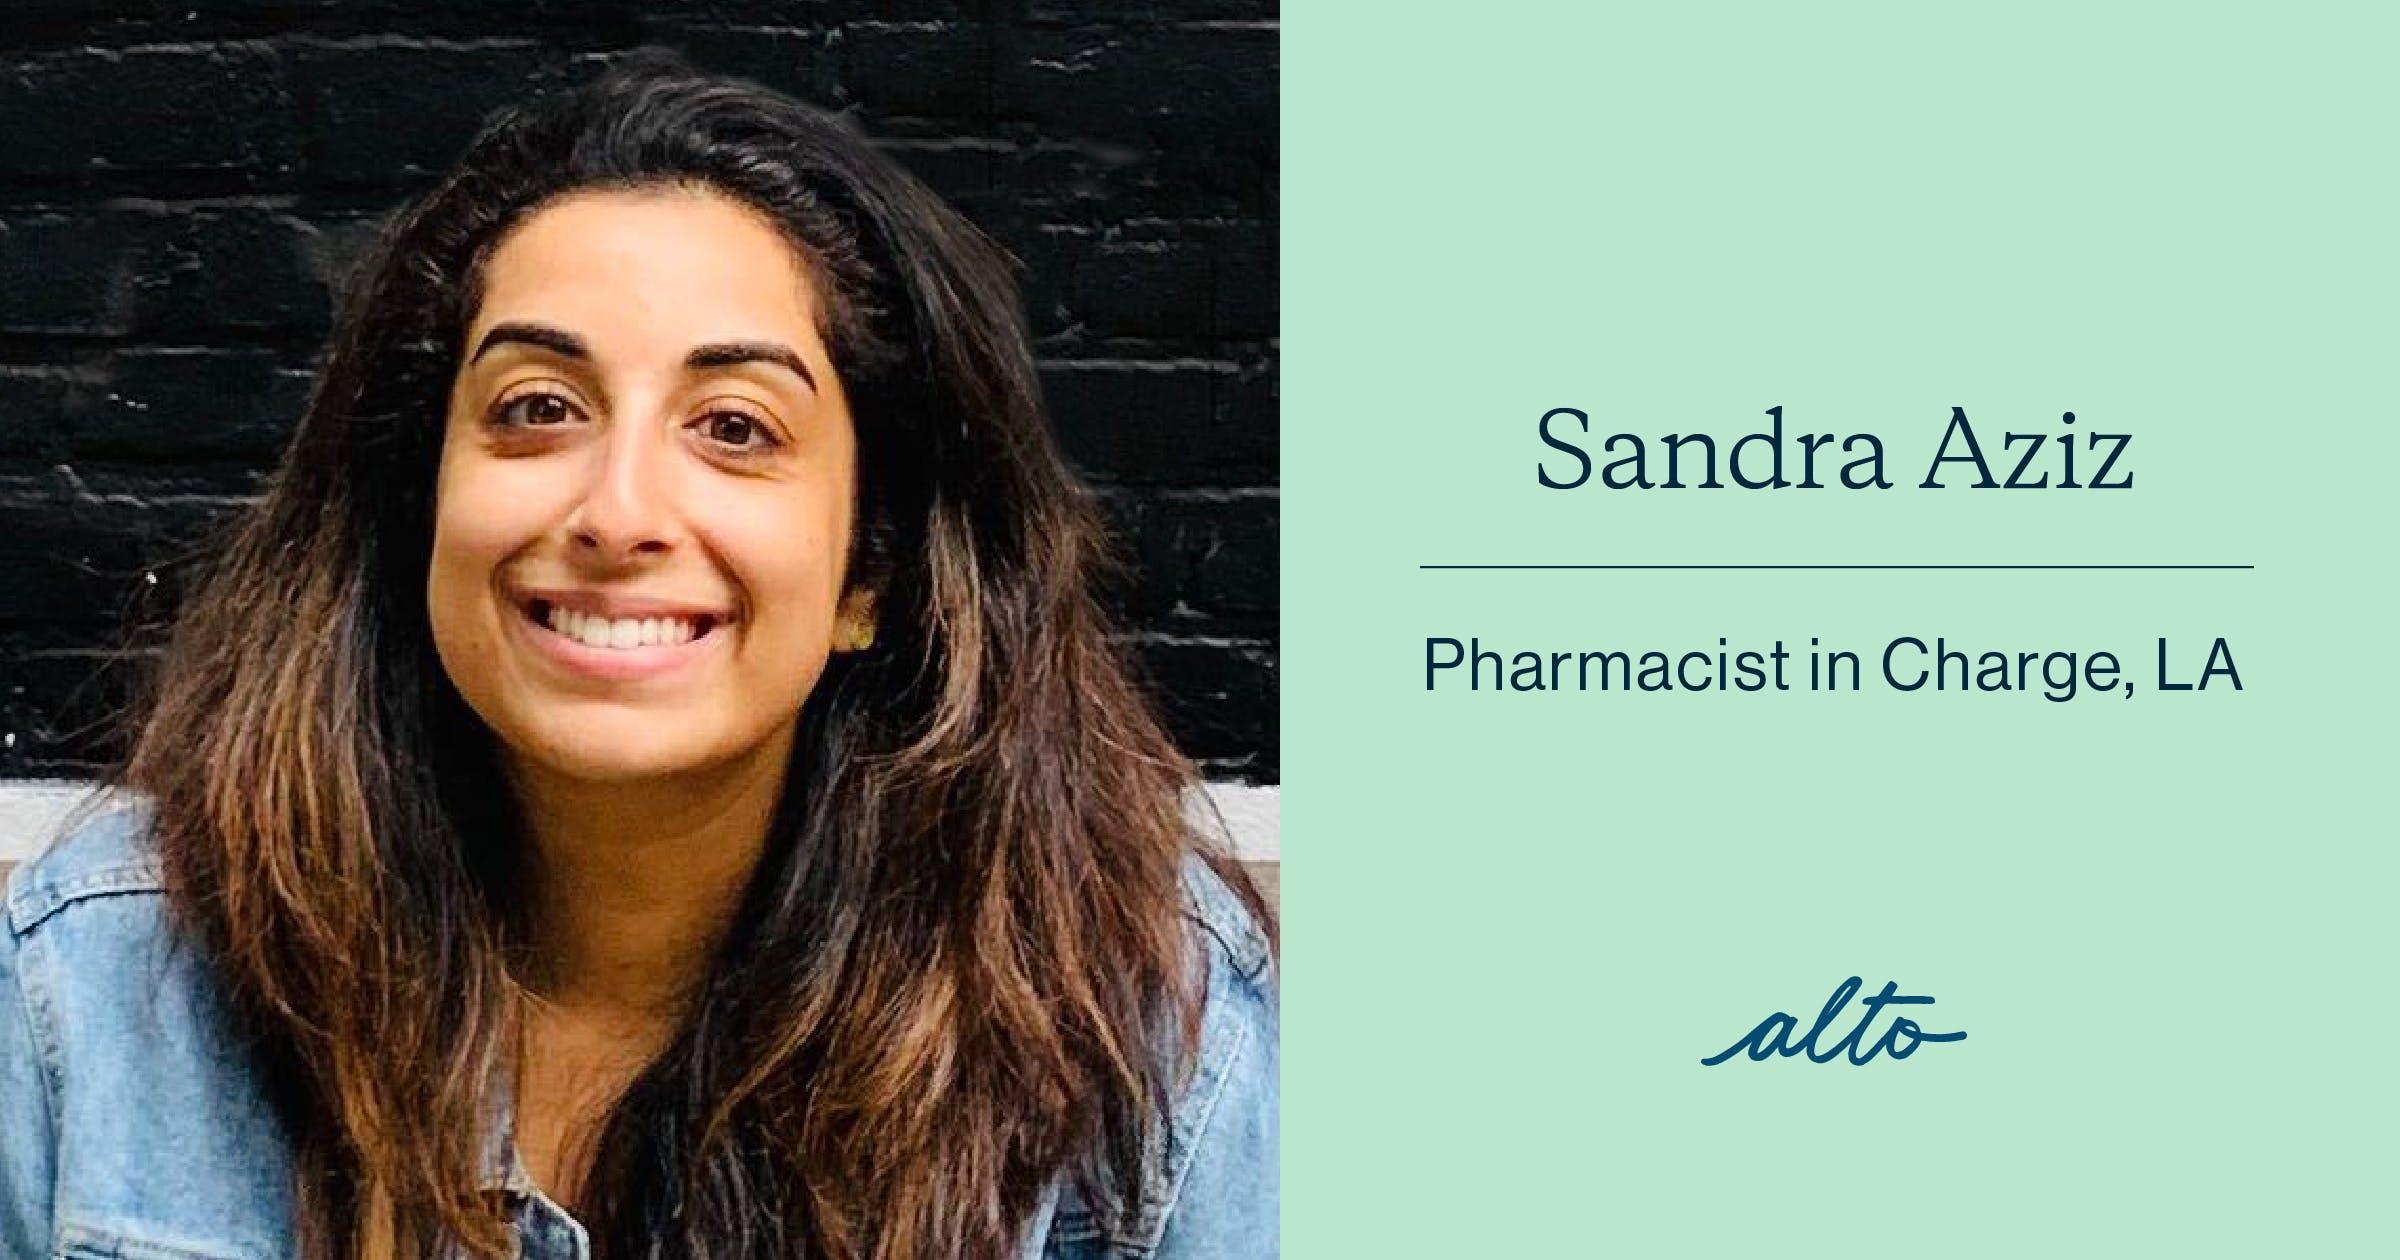 Sandra Aziz, Alto Pharmacist